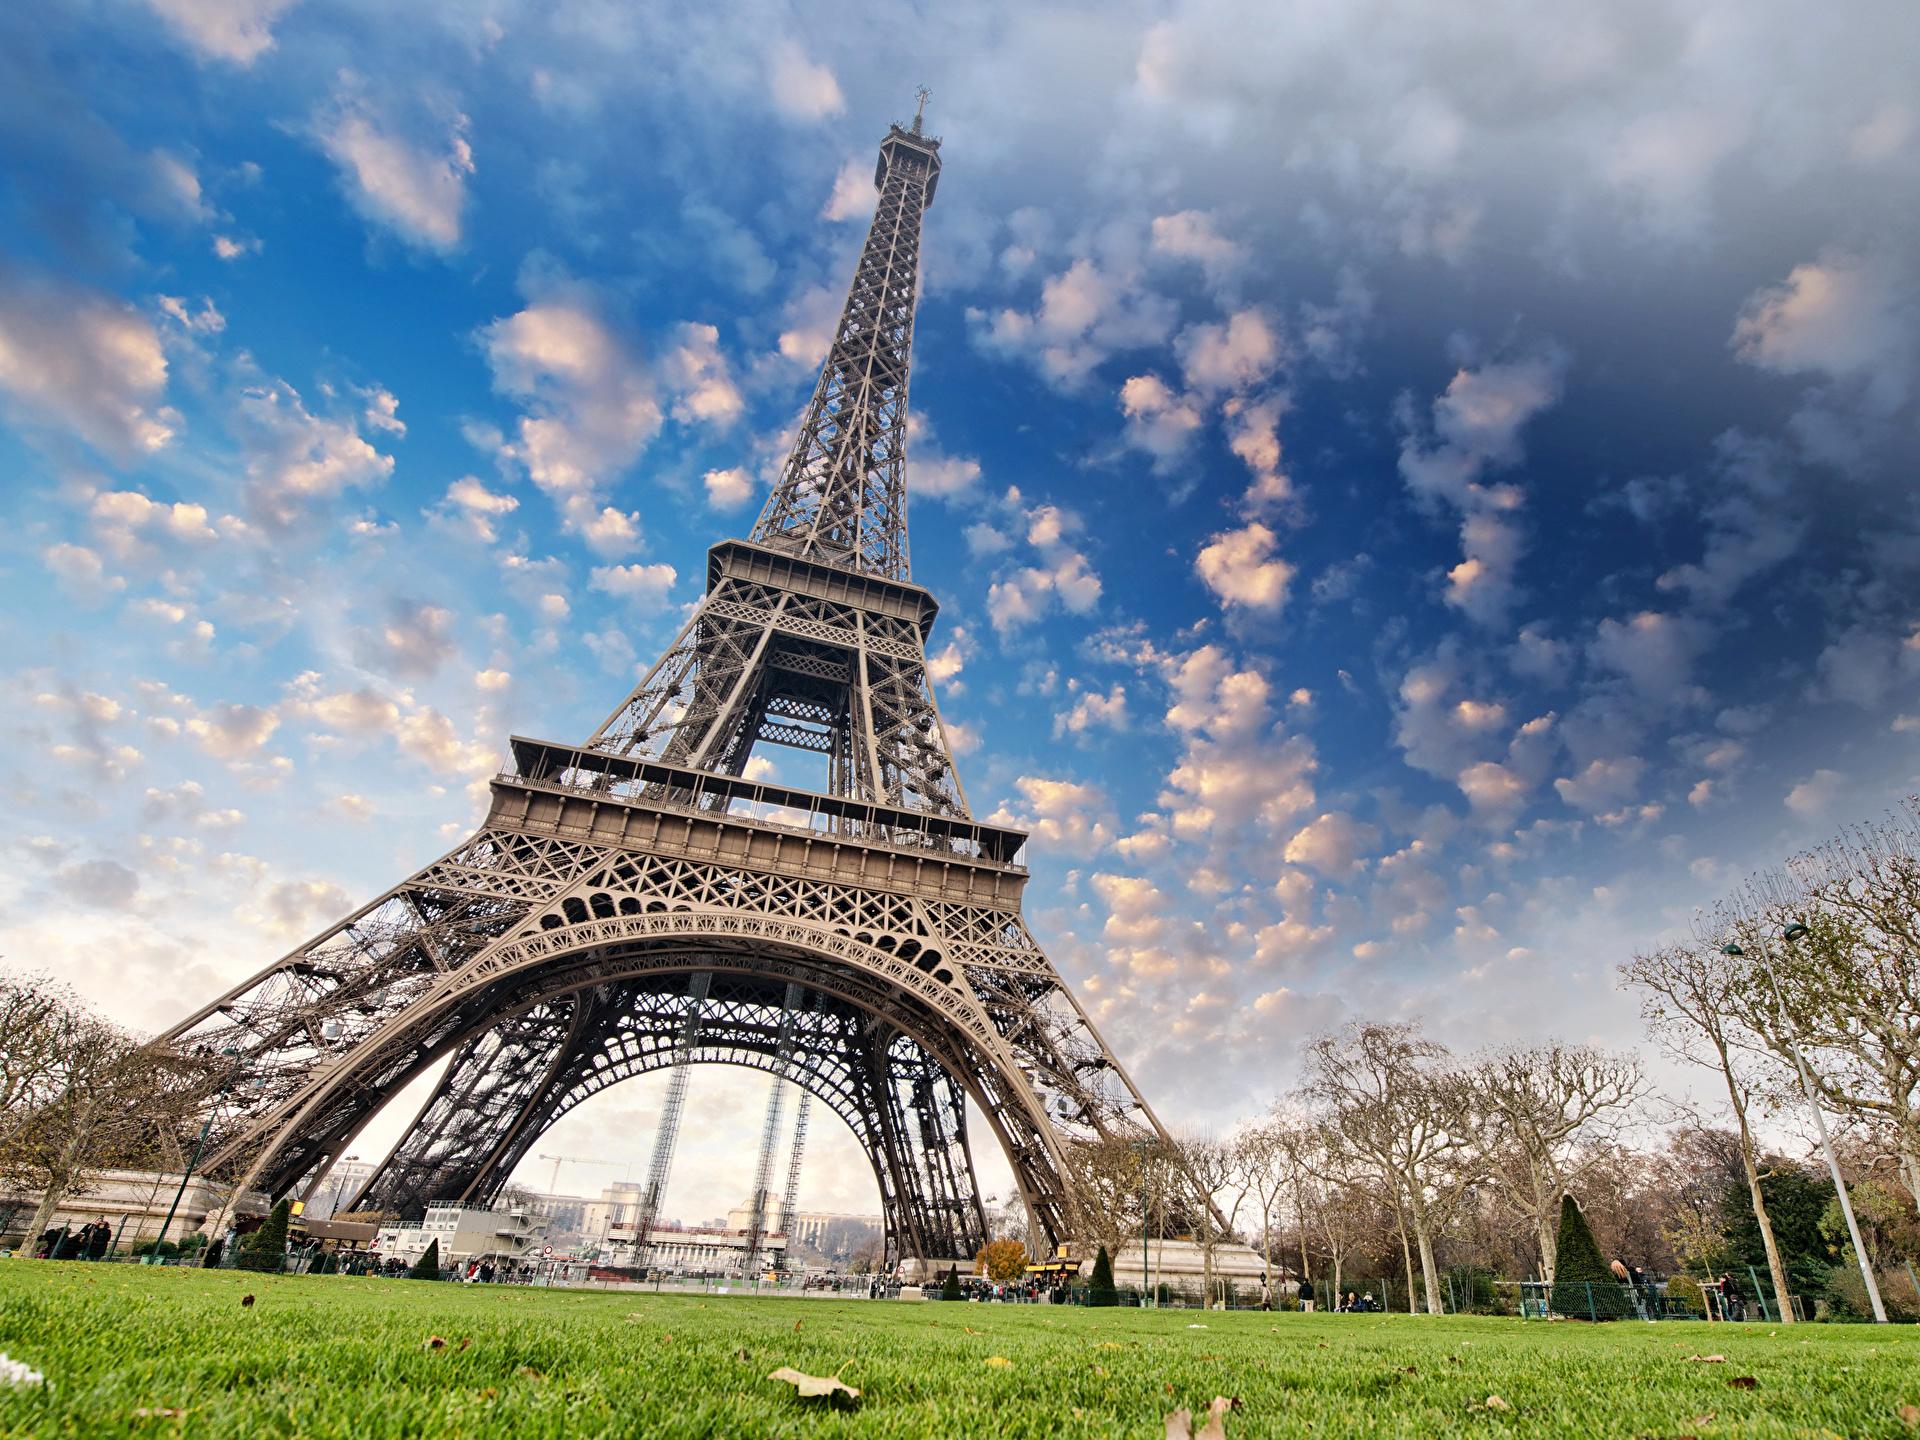 париж эйфелева башня высота Paris Eiffel tower height без смс